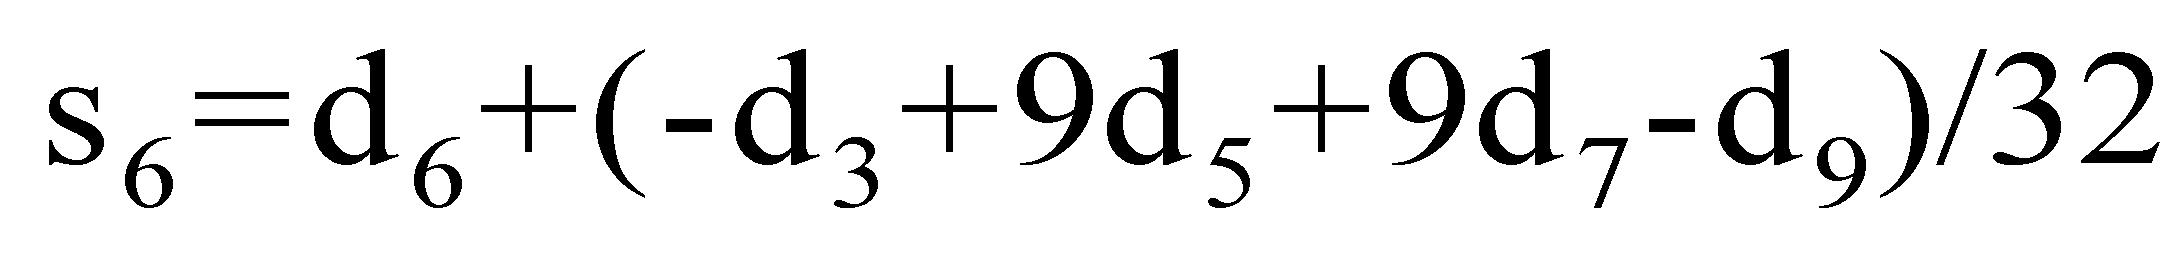 Figure 112003010478096-pat00002